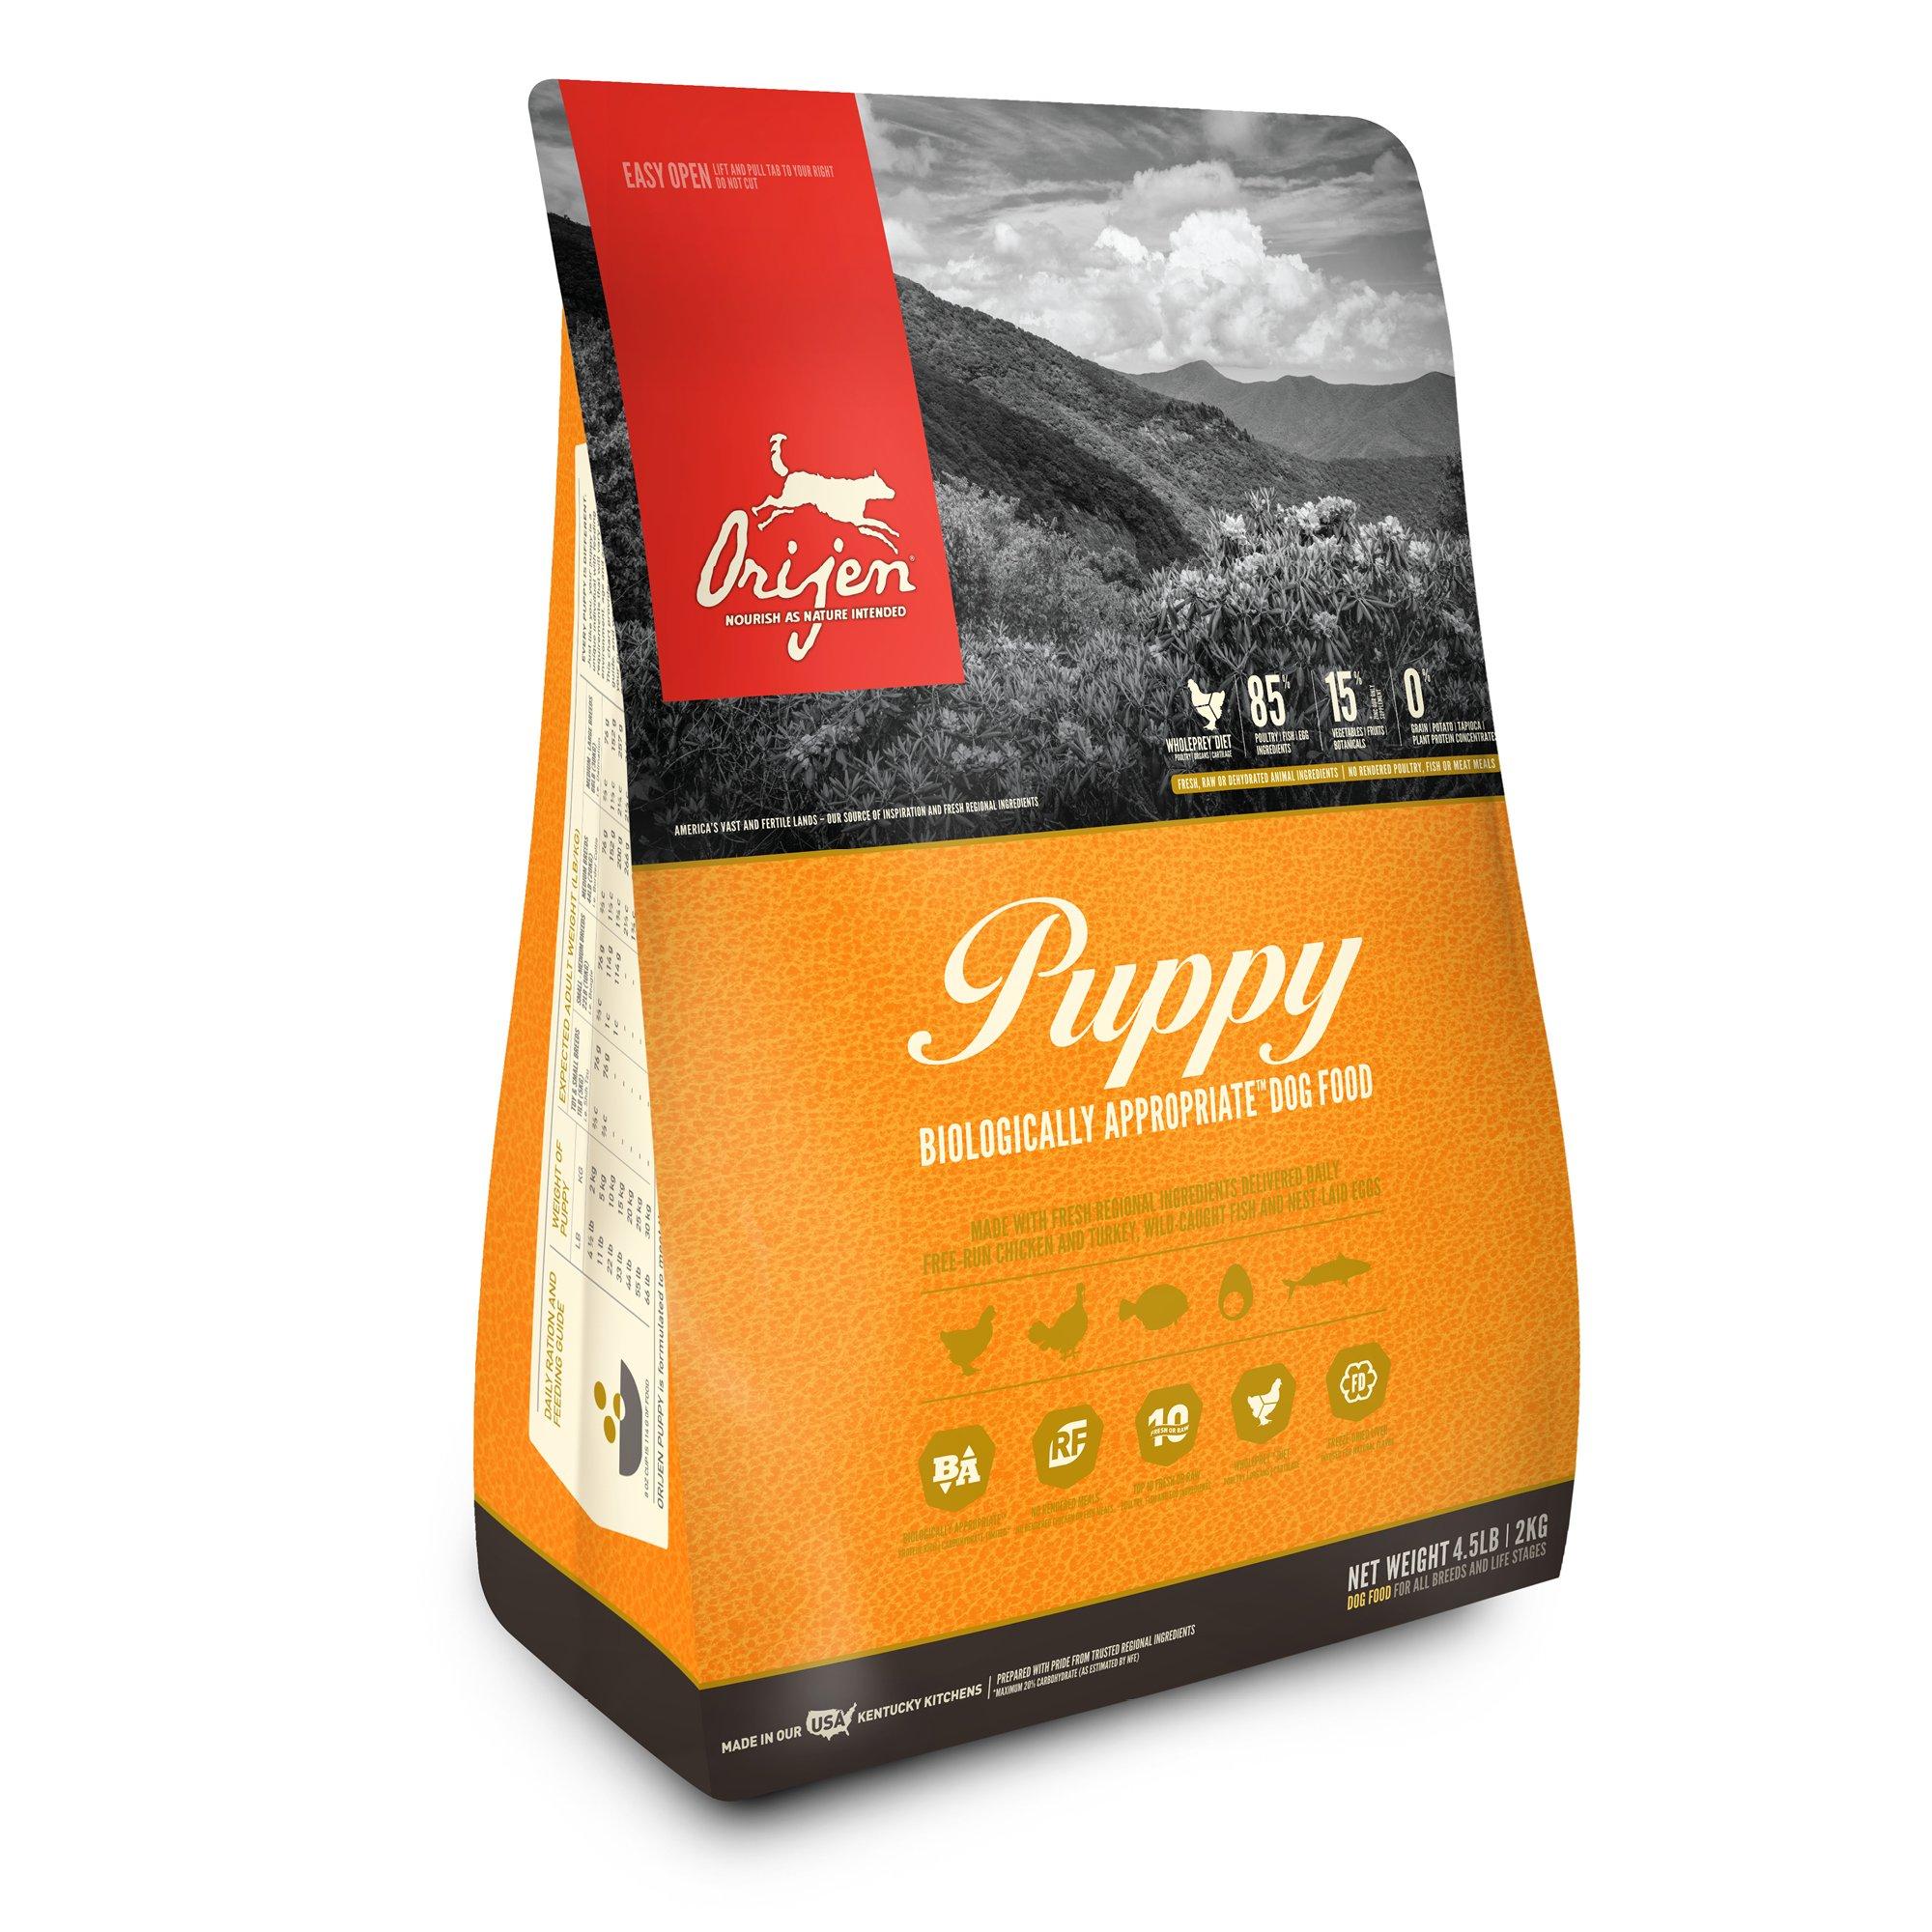 Orijen Puppy Dry Dog Food 4 5 Lbs Dry Dog Food Dog Food